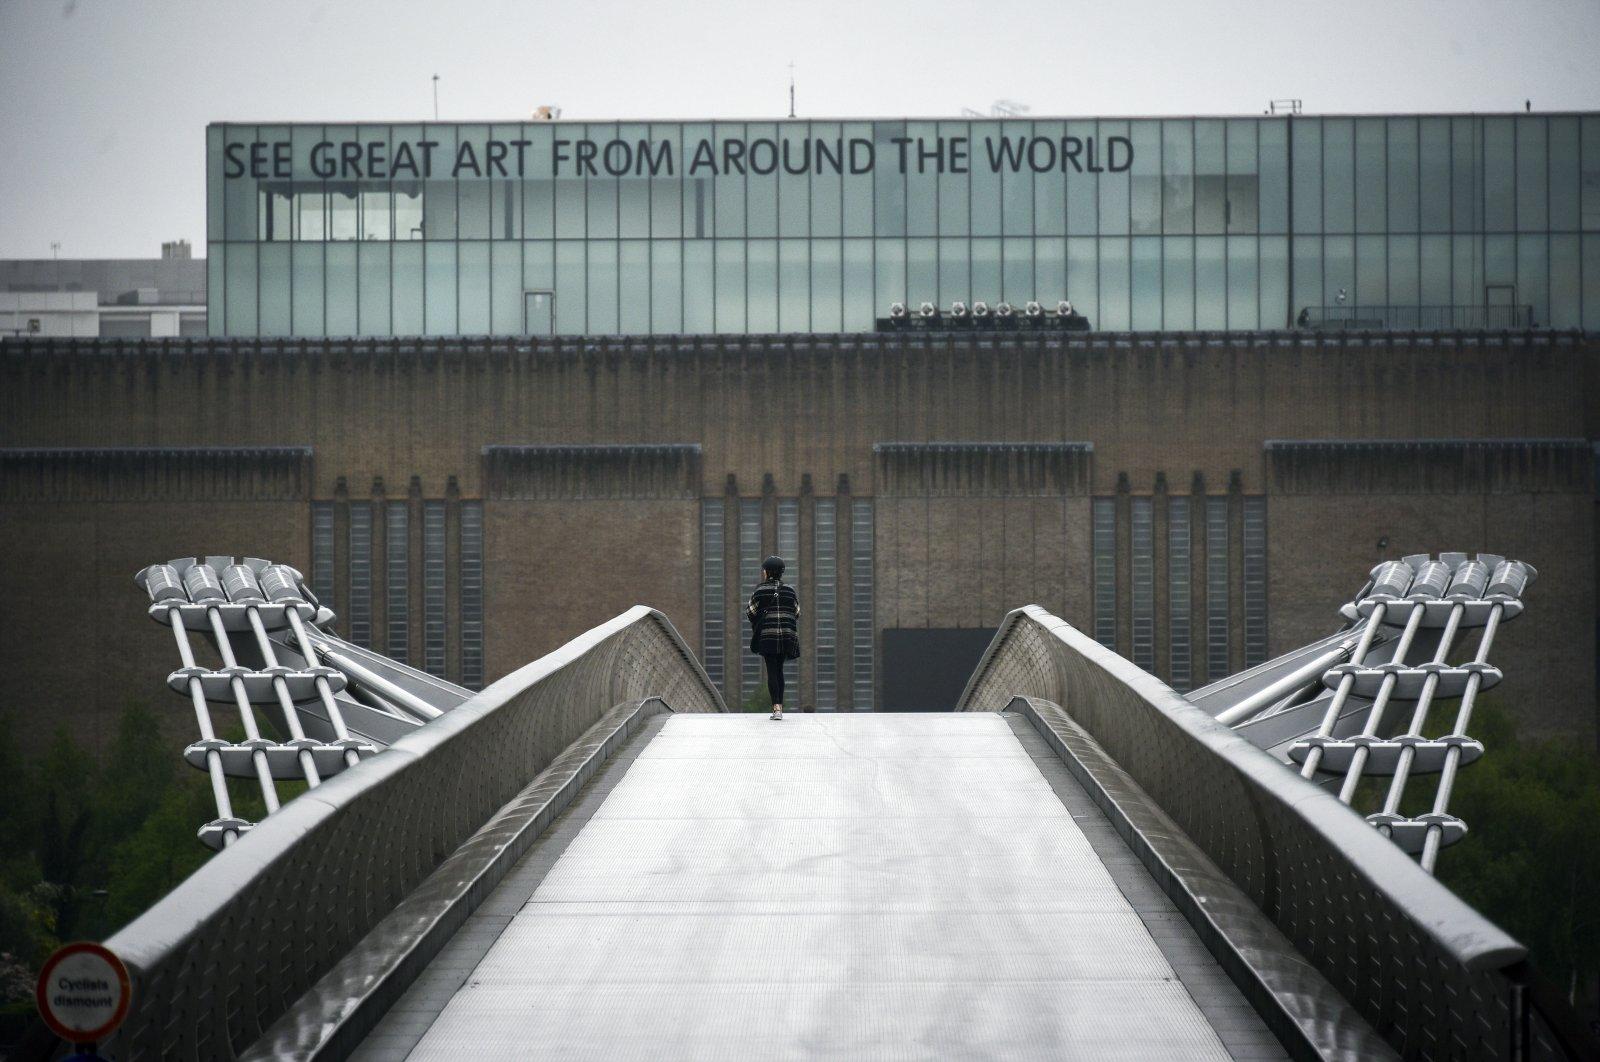 A woman walks on the nearly deserted Millennium Bridge as the rain falls, on the sixth week of lockdown due to the coronavirus outbreak, London, the U.K., April 28, 2020. (AP Photo)